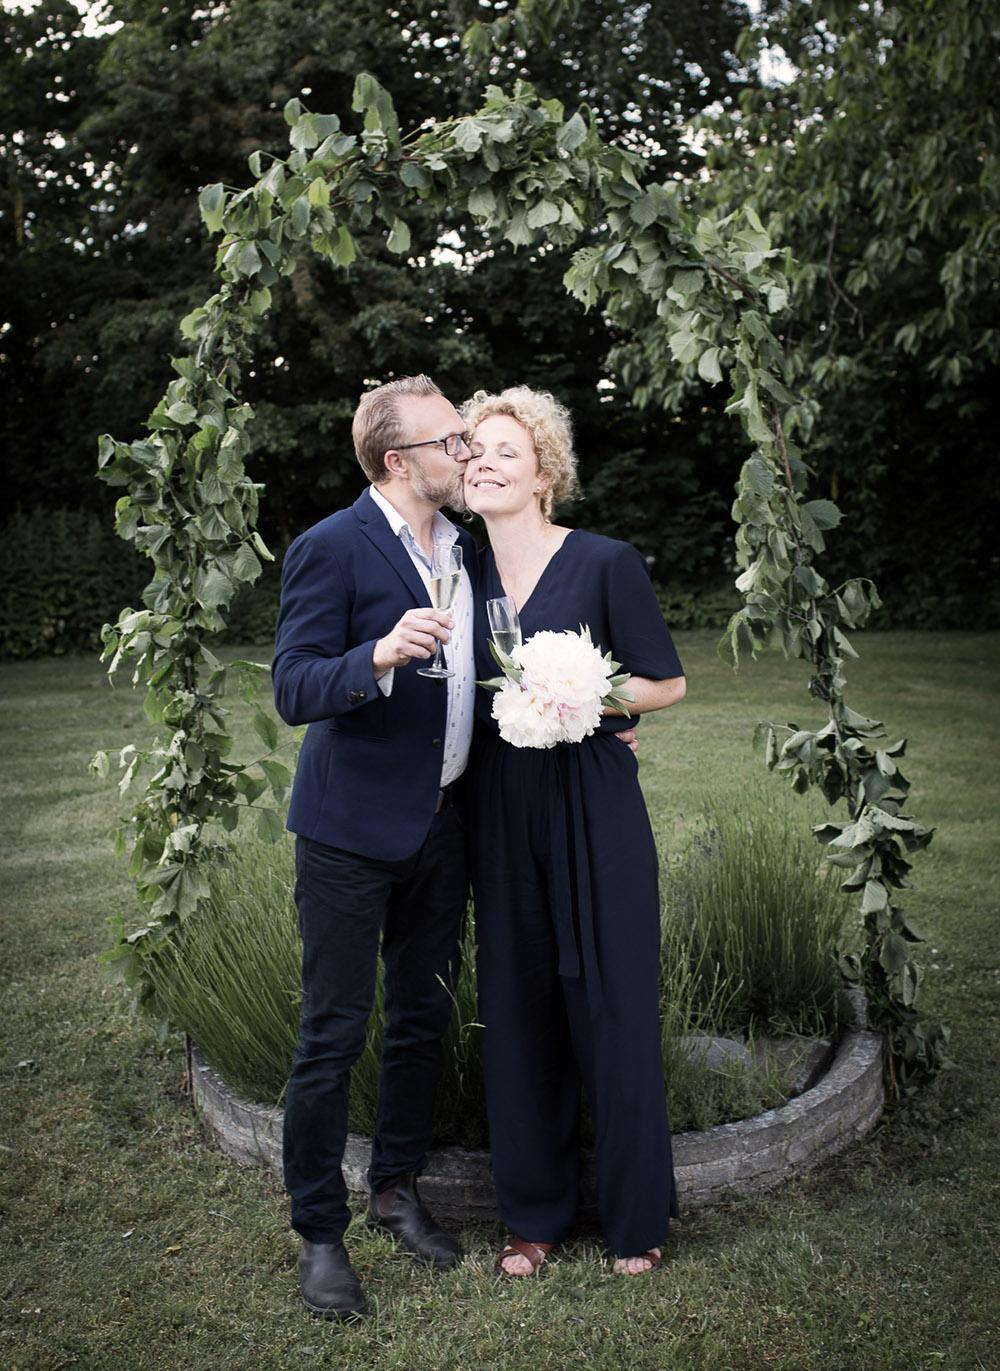 Bröllopsparet Witte